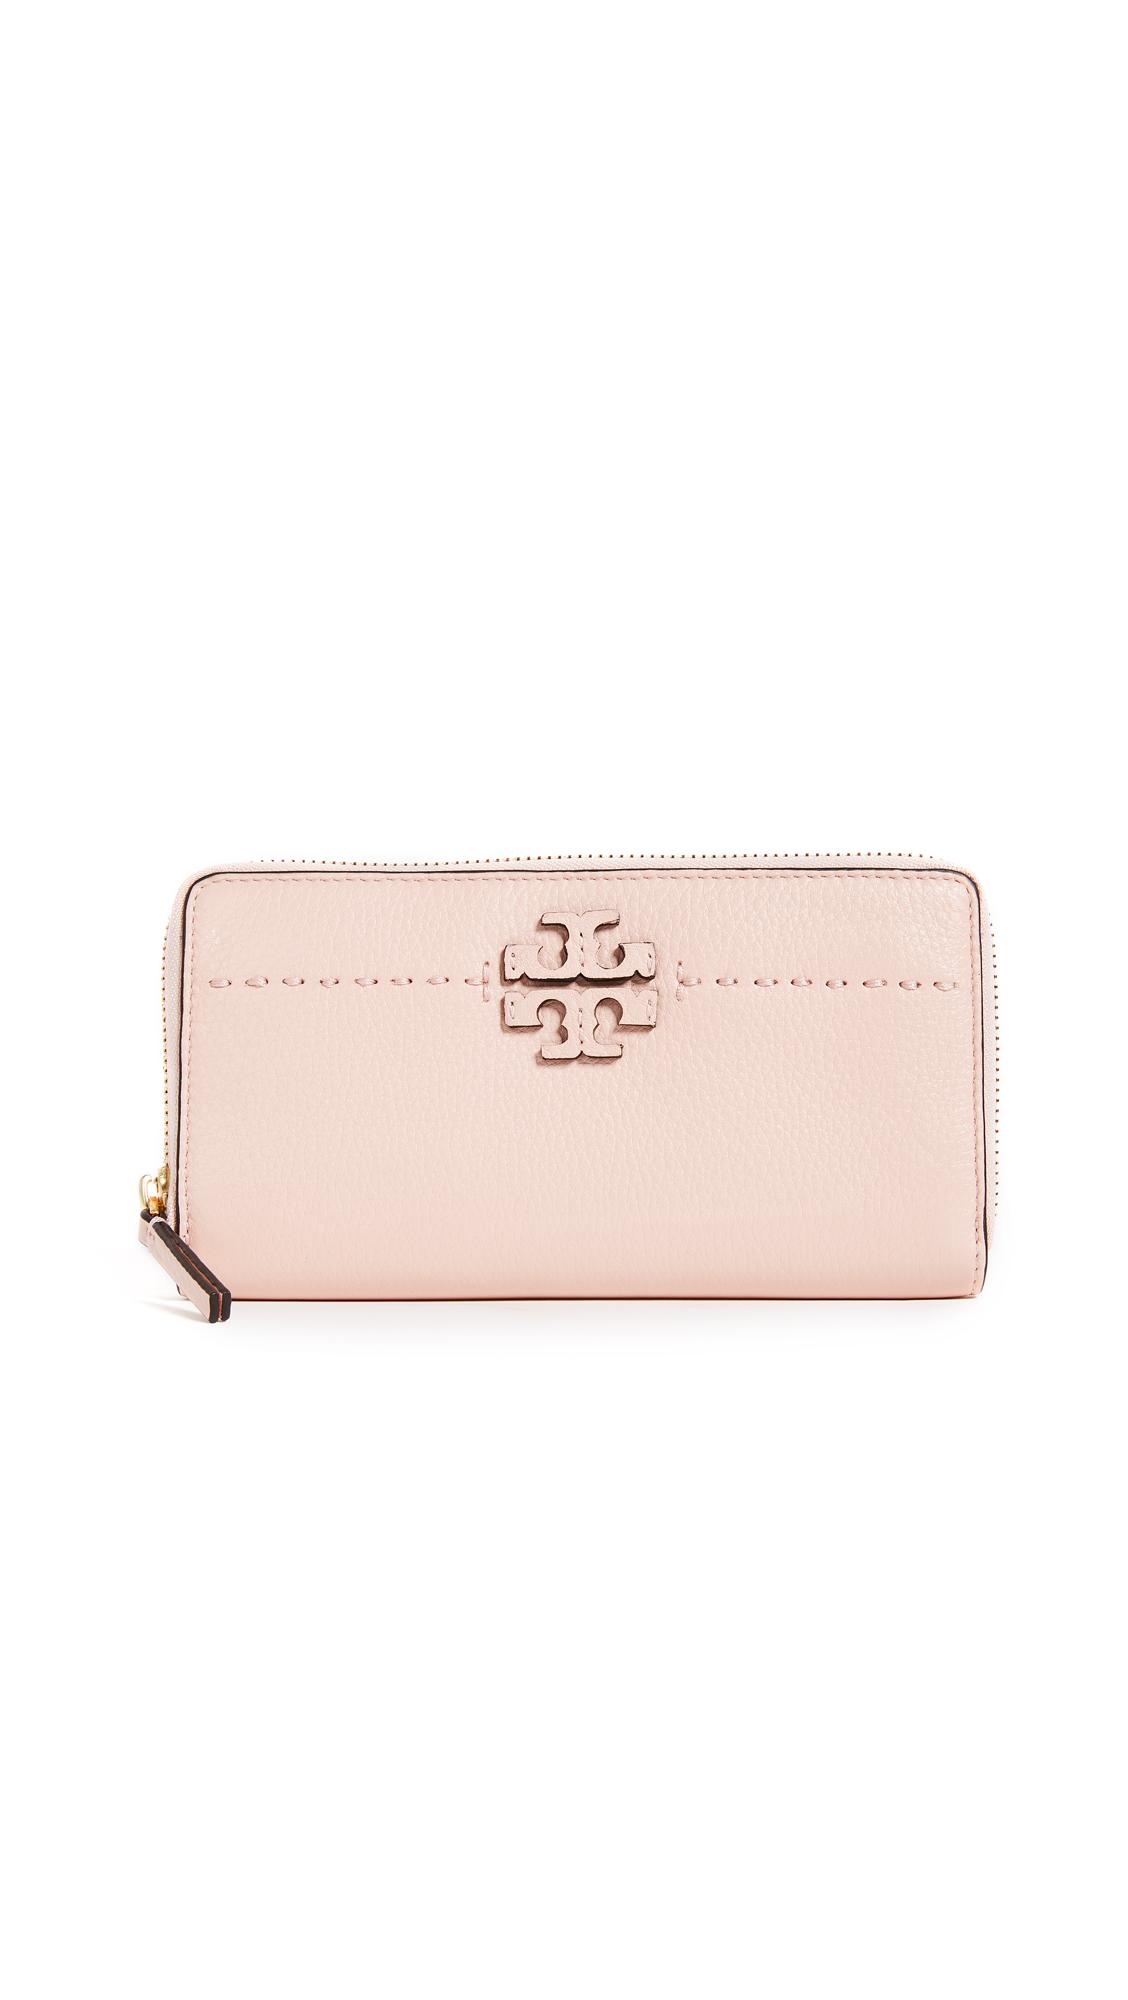 Tory Burch McGraw Zip Continental Wallet - Pink Quartz